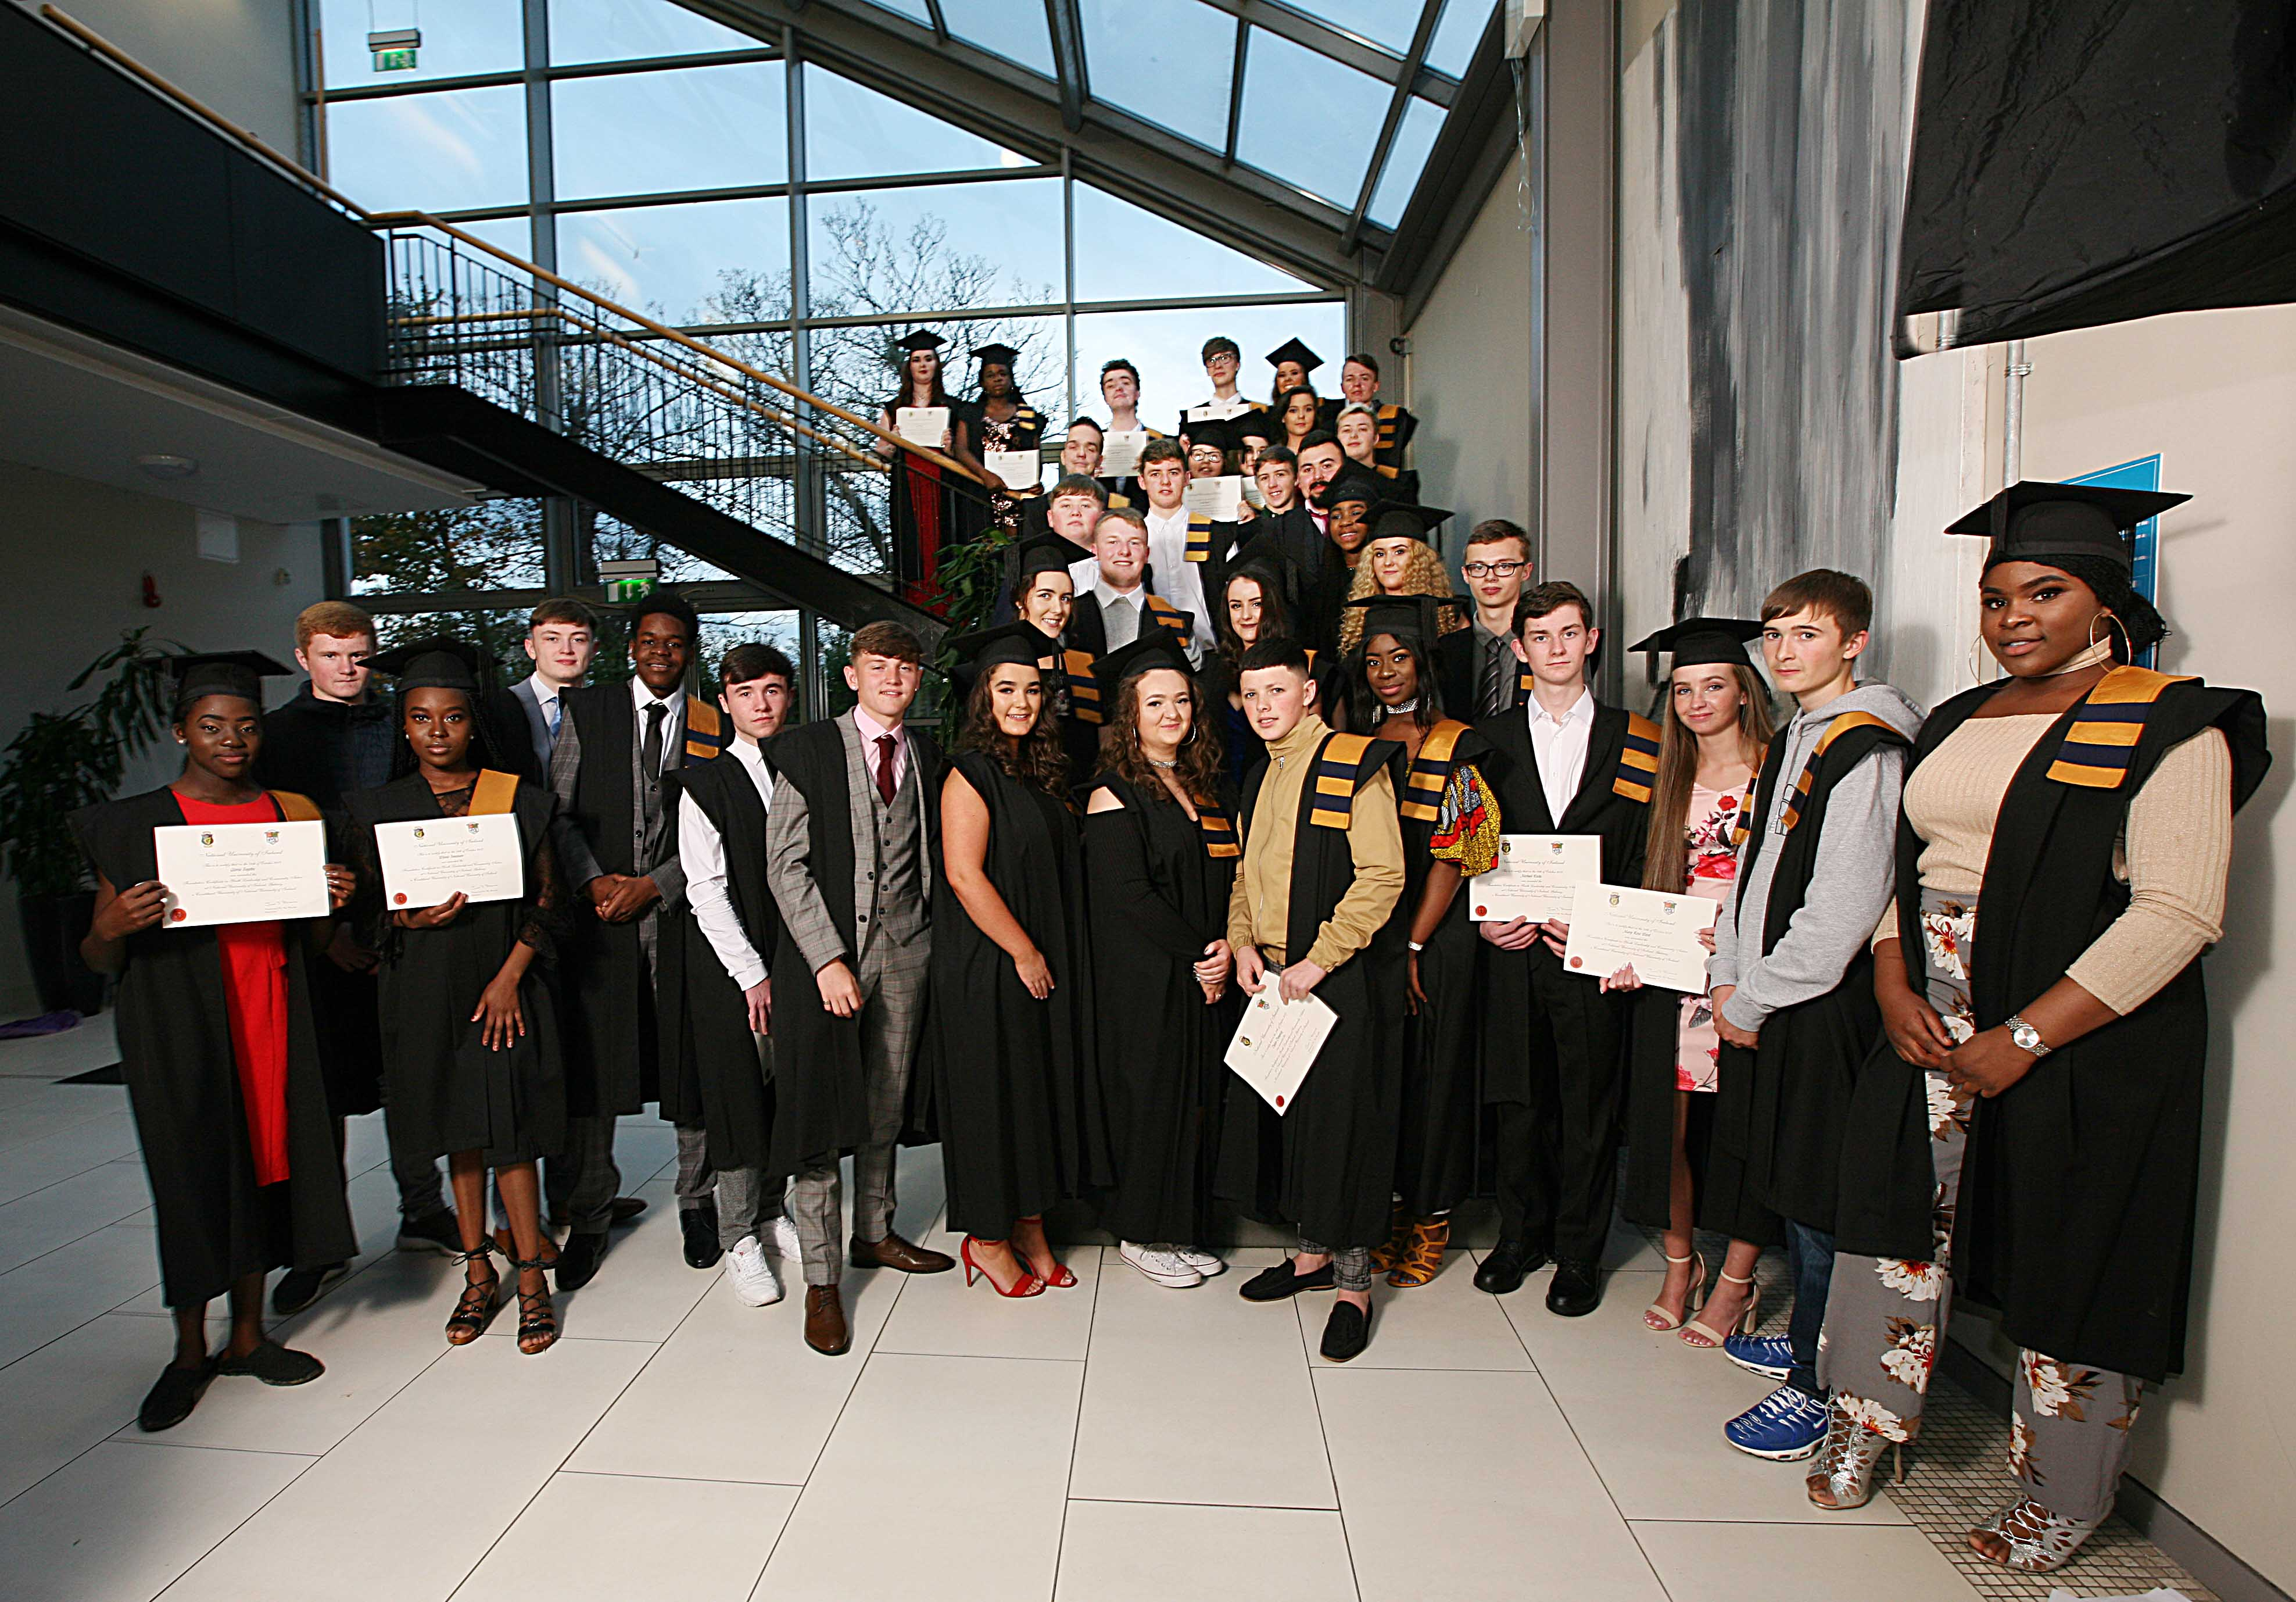 NUIG Graduations Tallaght Foroige